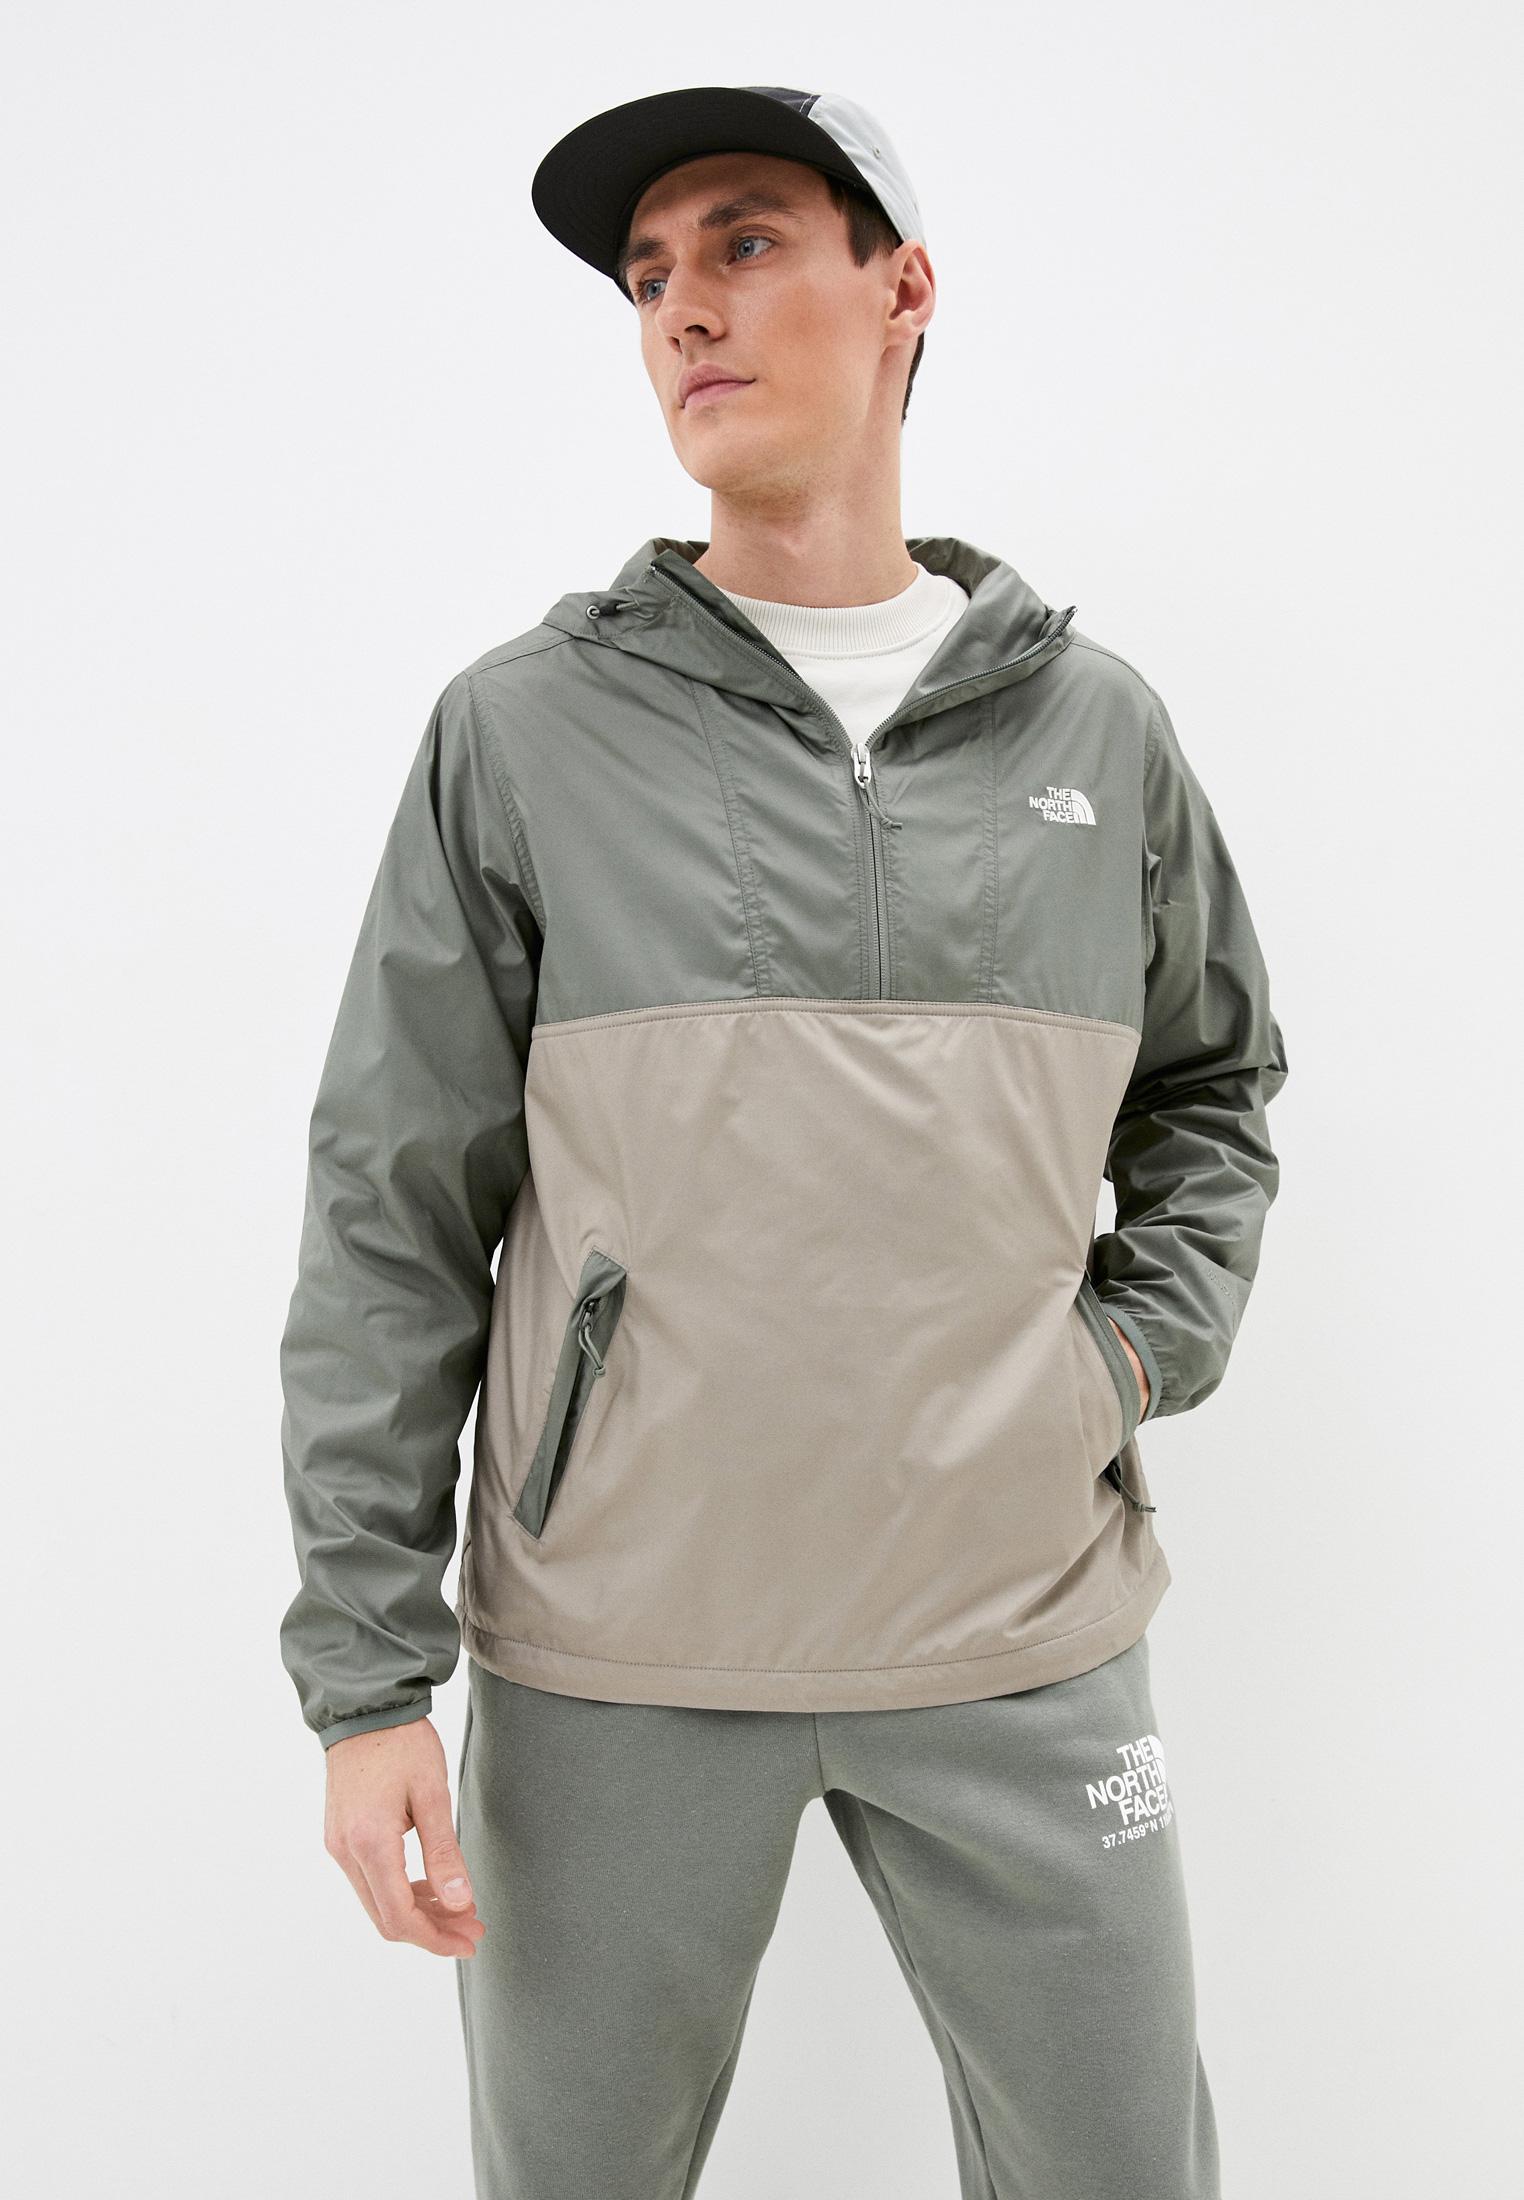 Мужская верхняя одежда The North Face (Зе Норт Фейс) TA5A3H